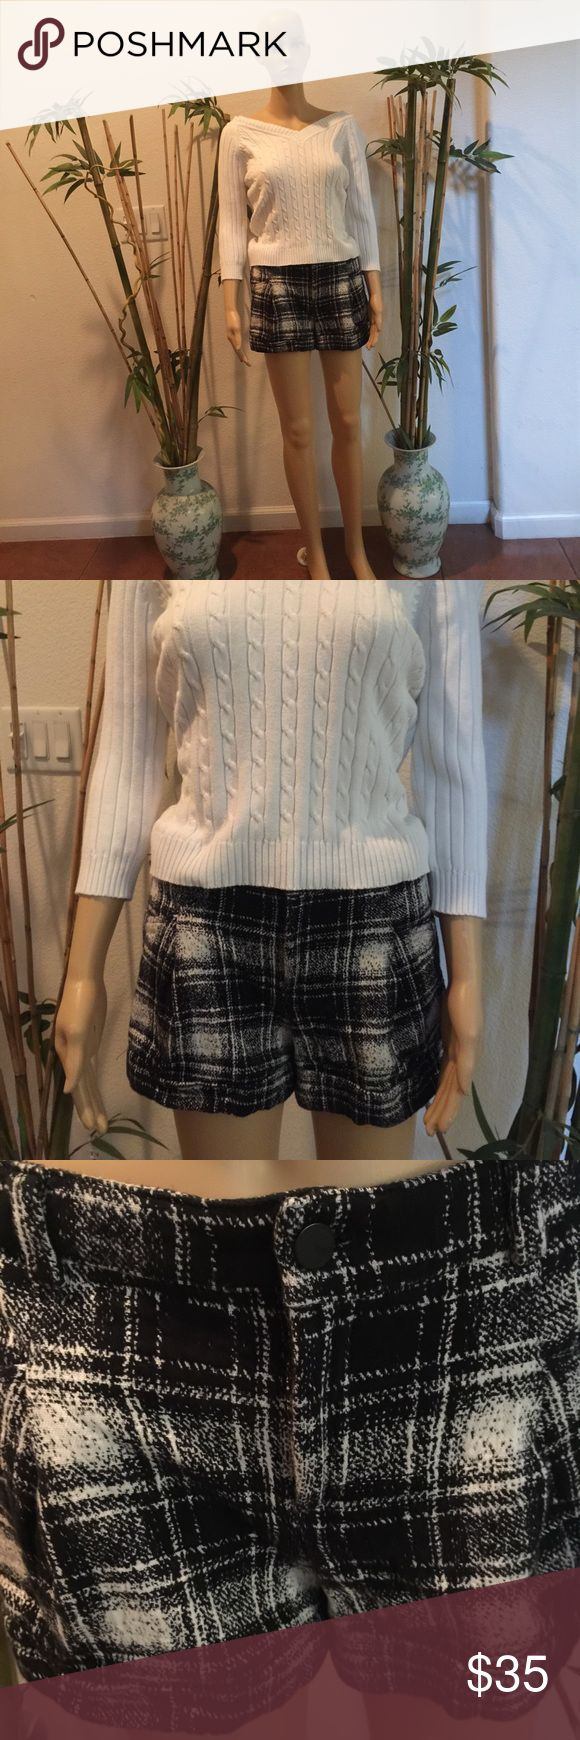 Mango shorts size 6 &  Faded Glory knitted blouse Used medium-sized Faded Glory blouse. Shorts not used at all. Both machine washable. Free neck accessory included!!! Mango Shorts Skorts